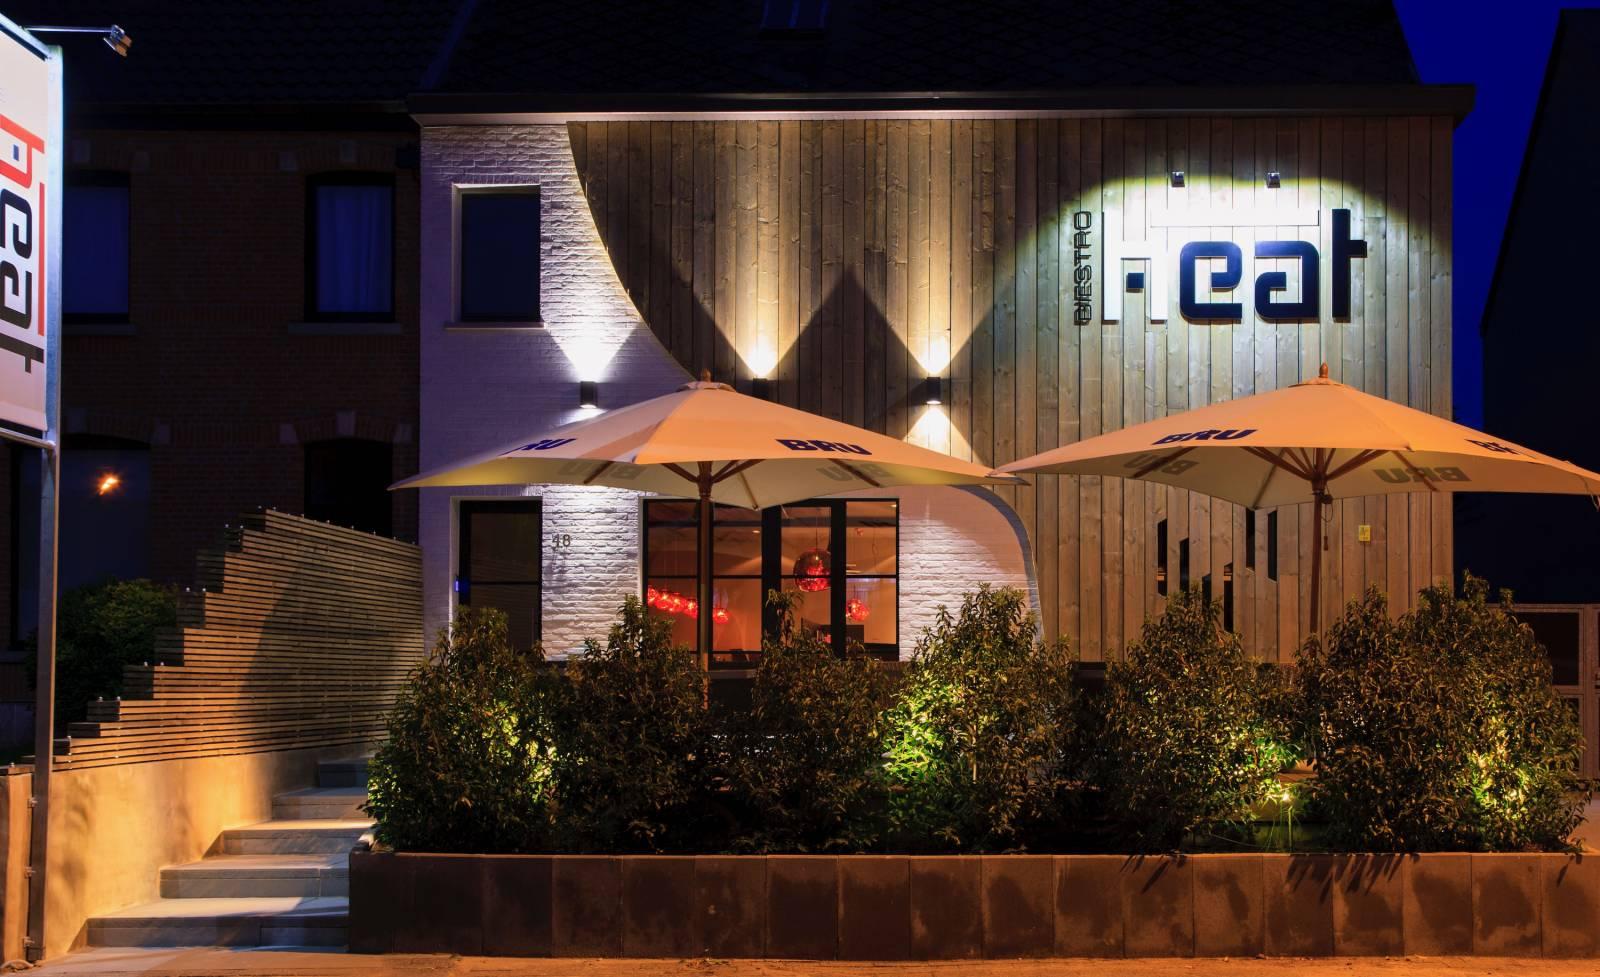 Tertia Catering25_Bernt Hendrickx - House of Weddings